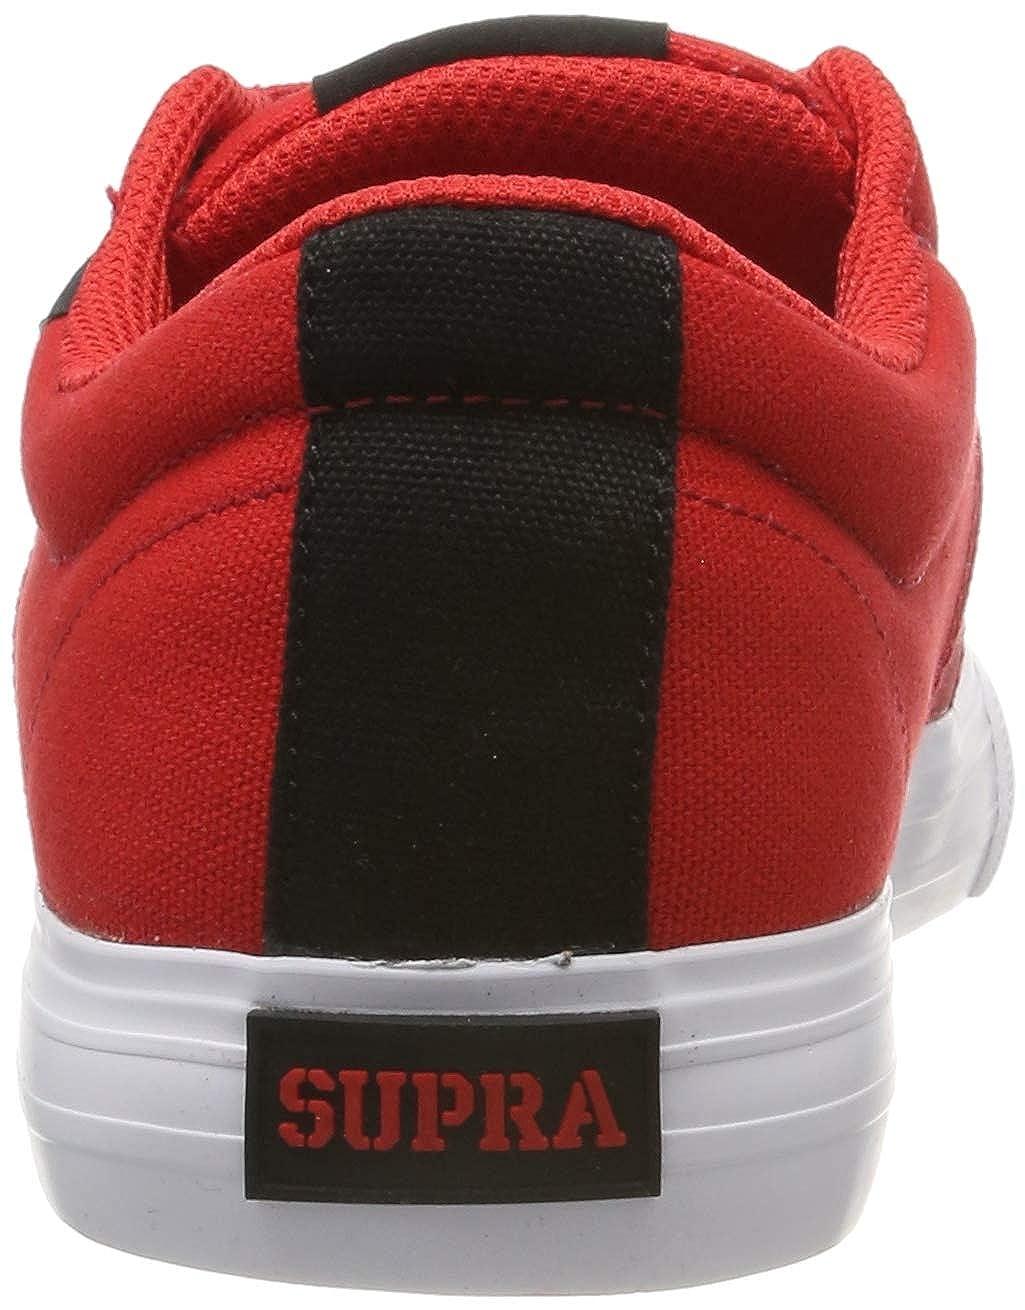 Supra Stacks II Vulc Chaussures de Skateboard Mixte Adulte